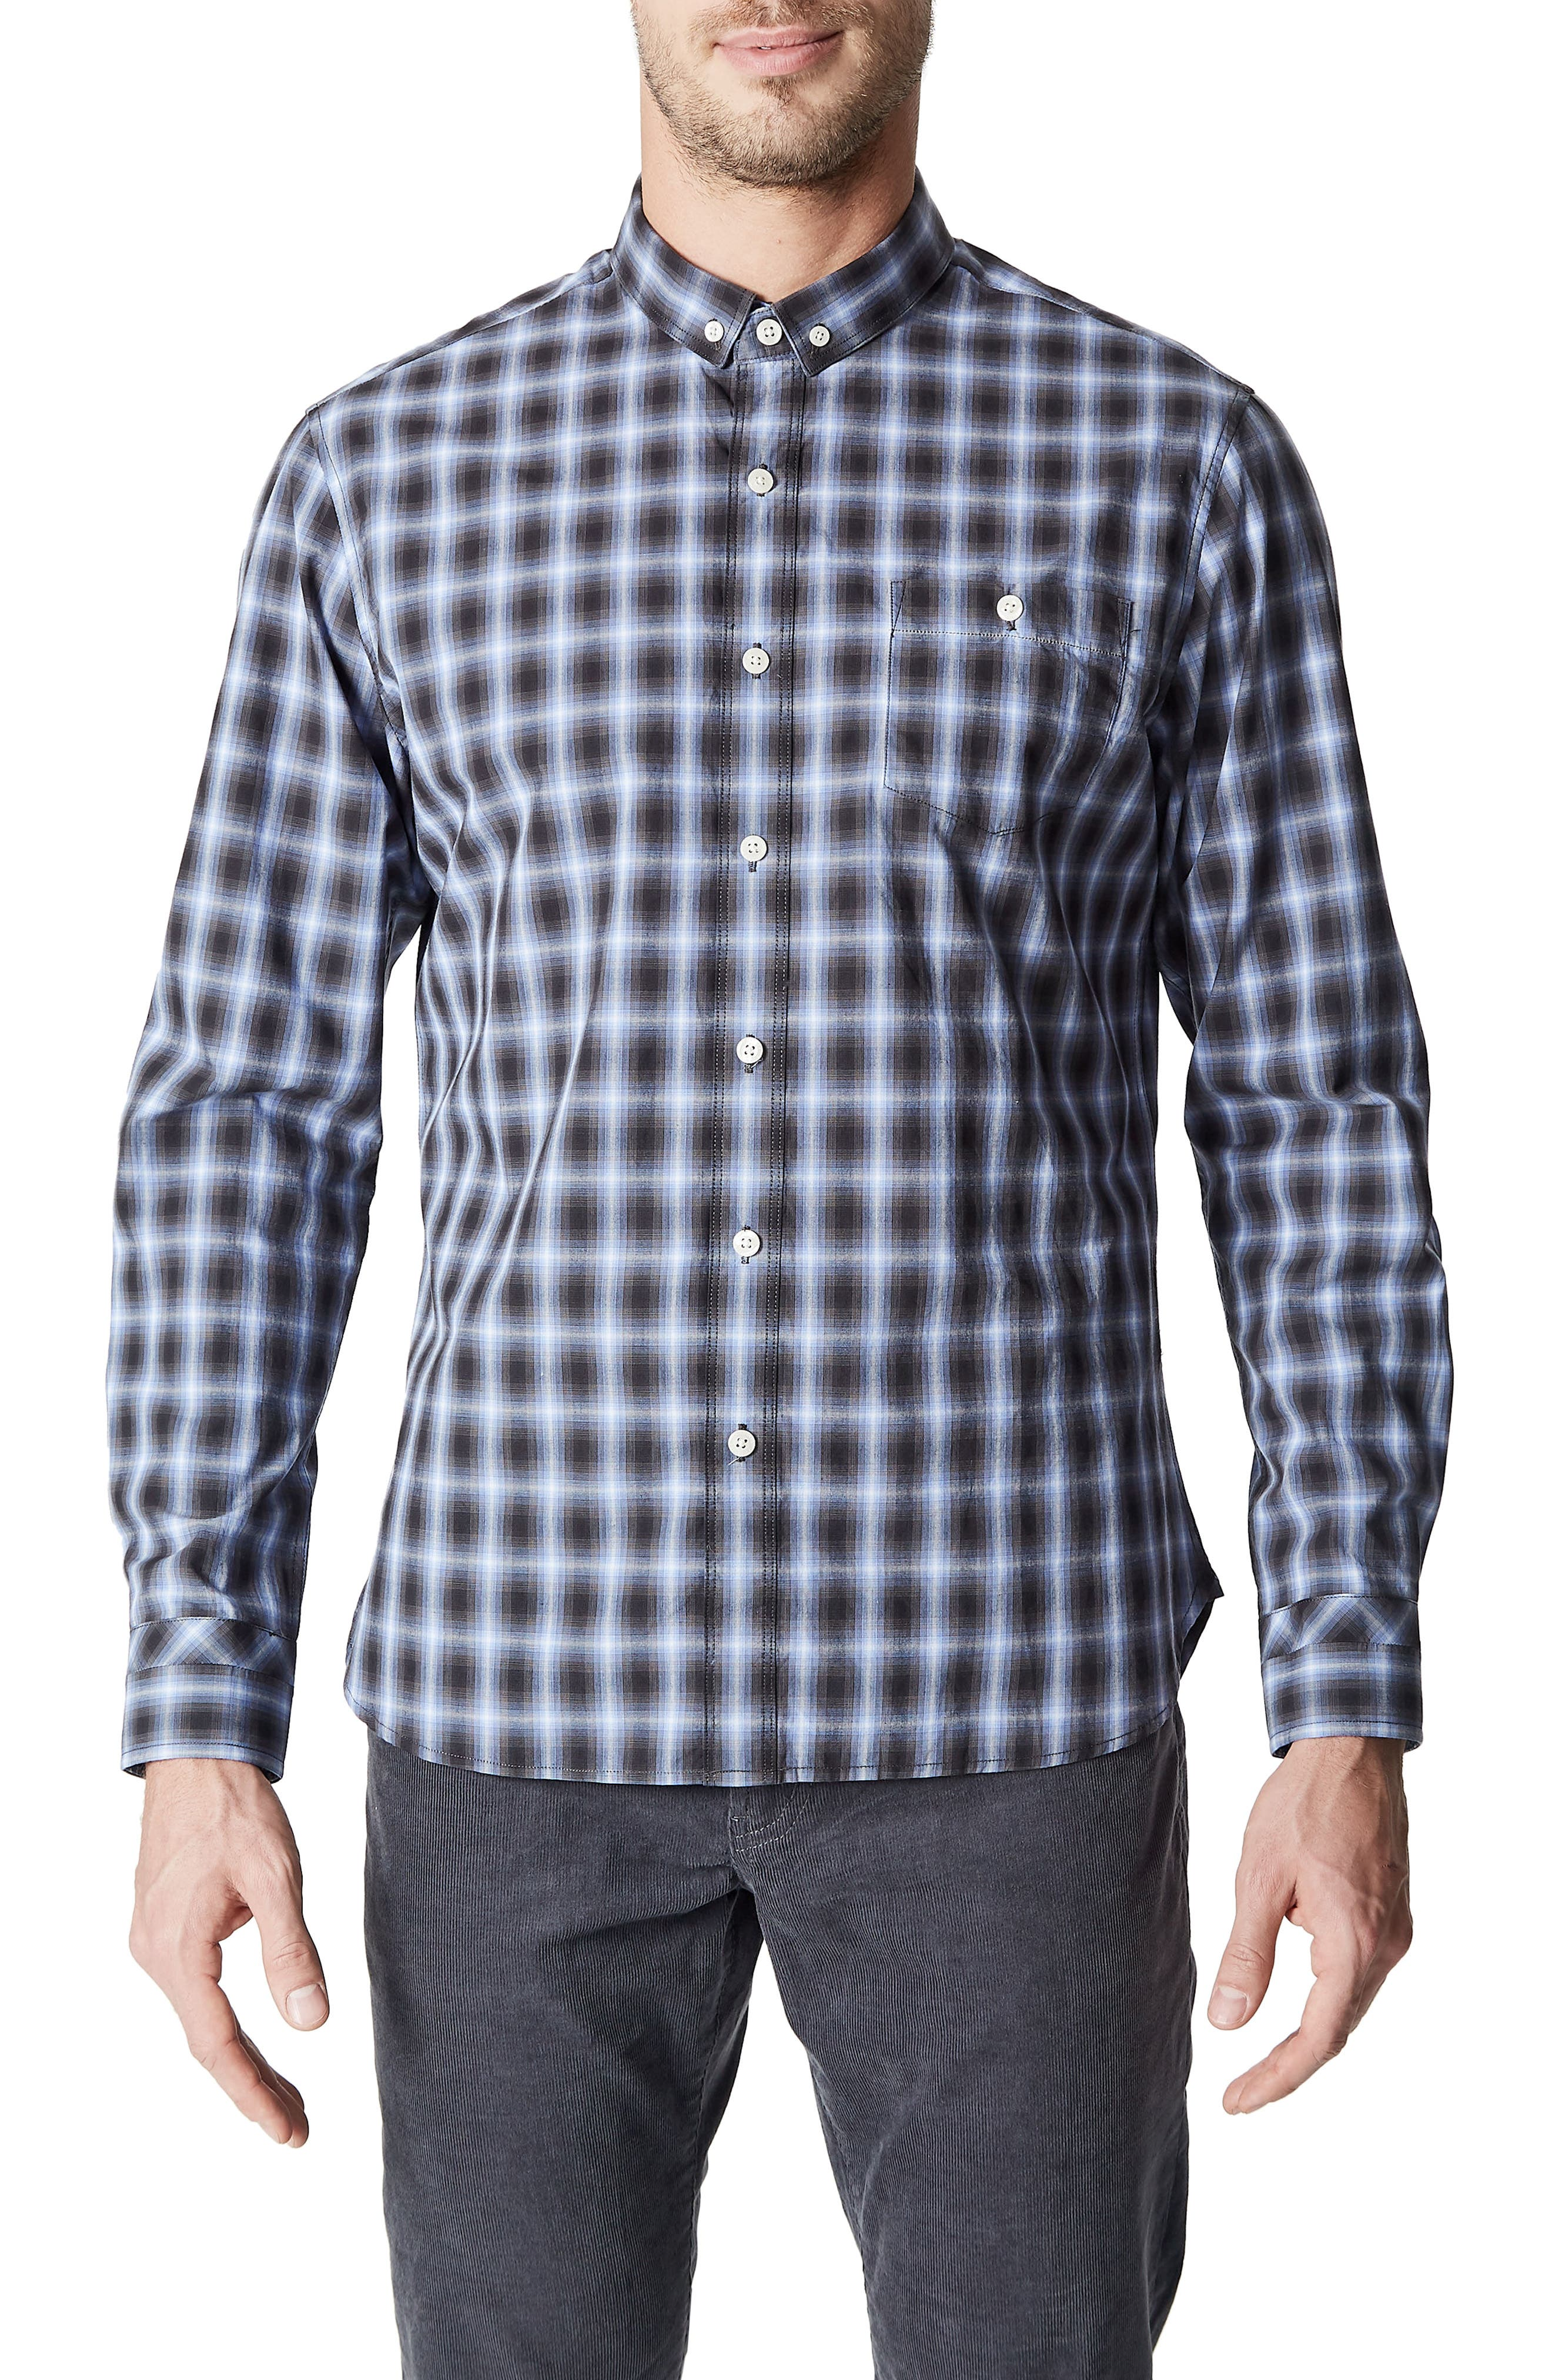 Higher Ground Woven Shirt,                             Main thumbnail 1, color,                             Blue